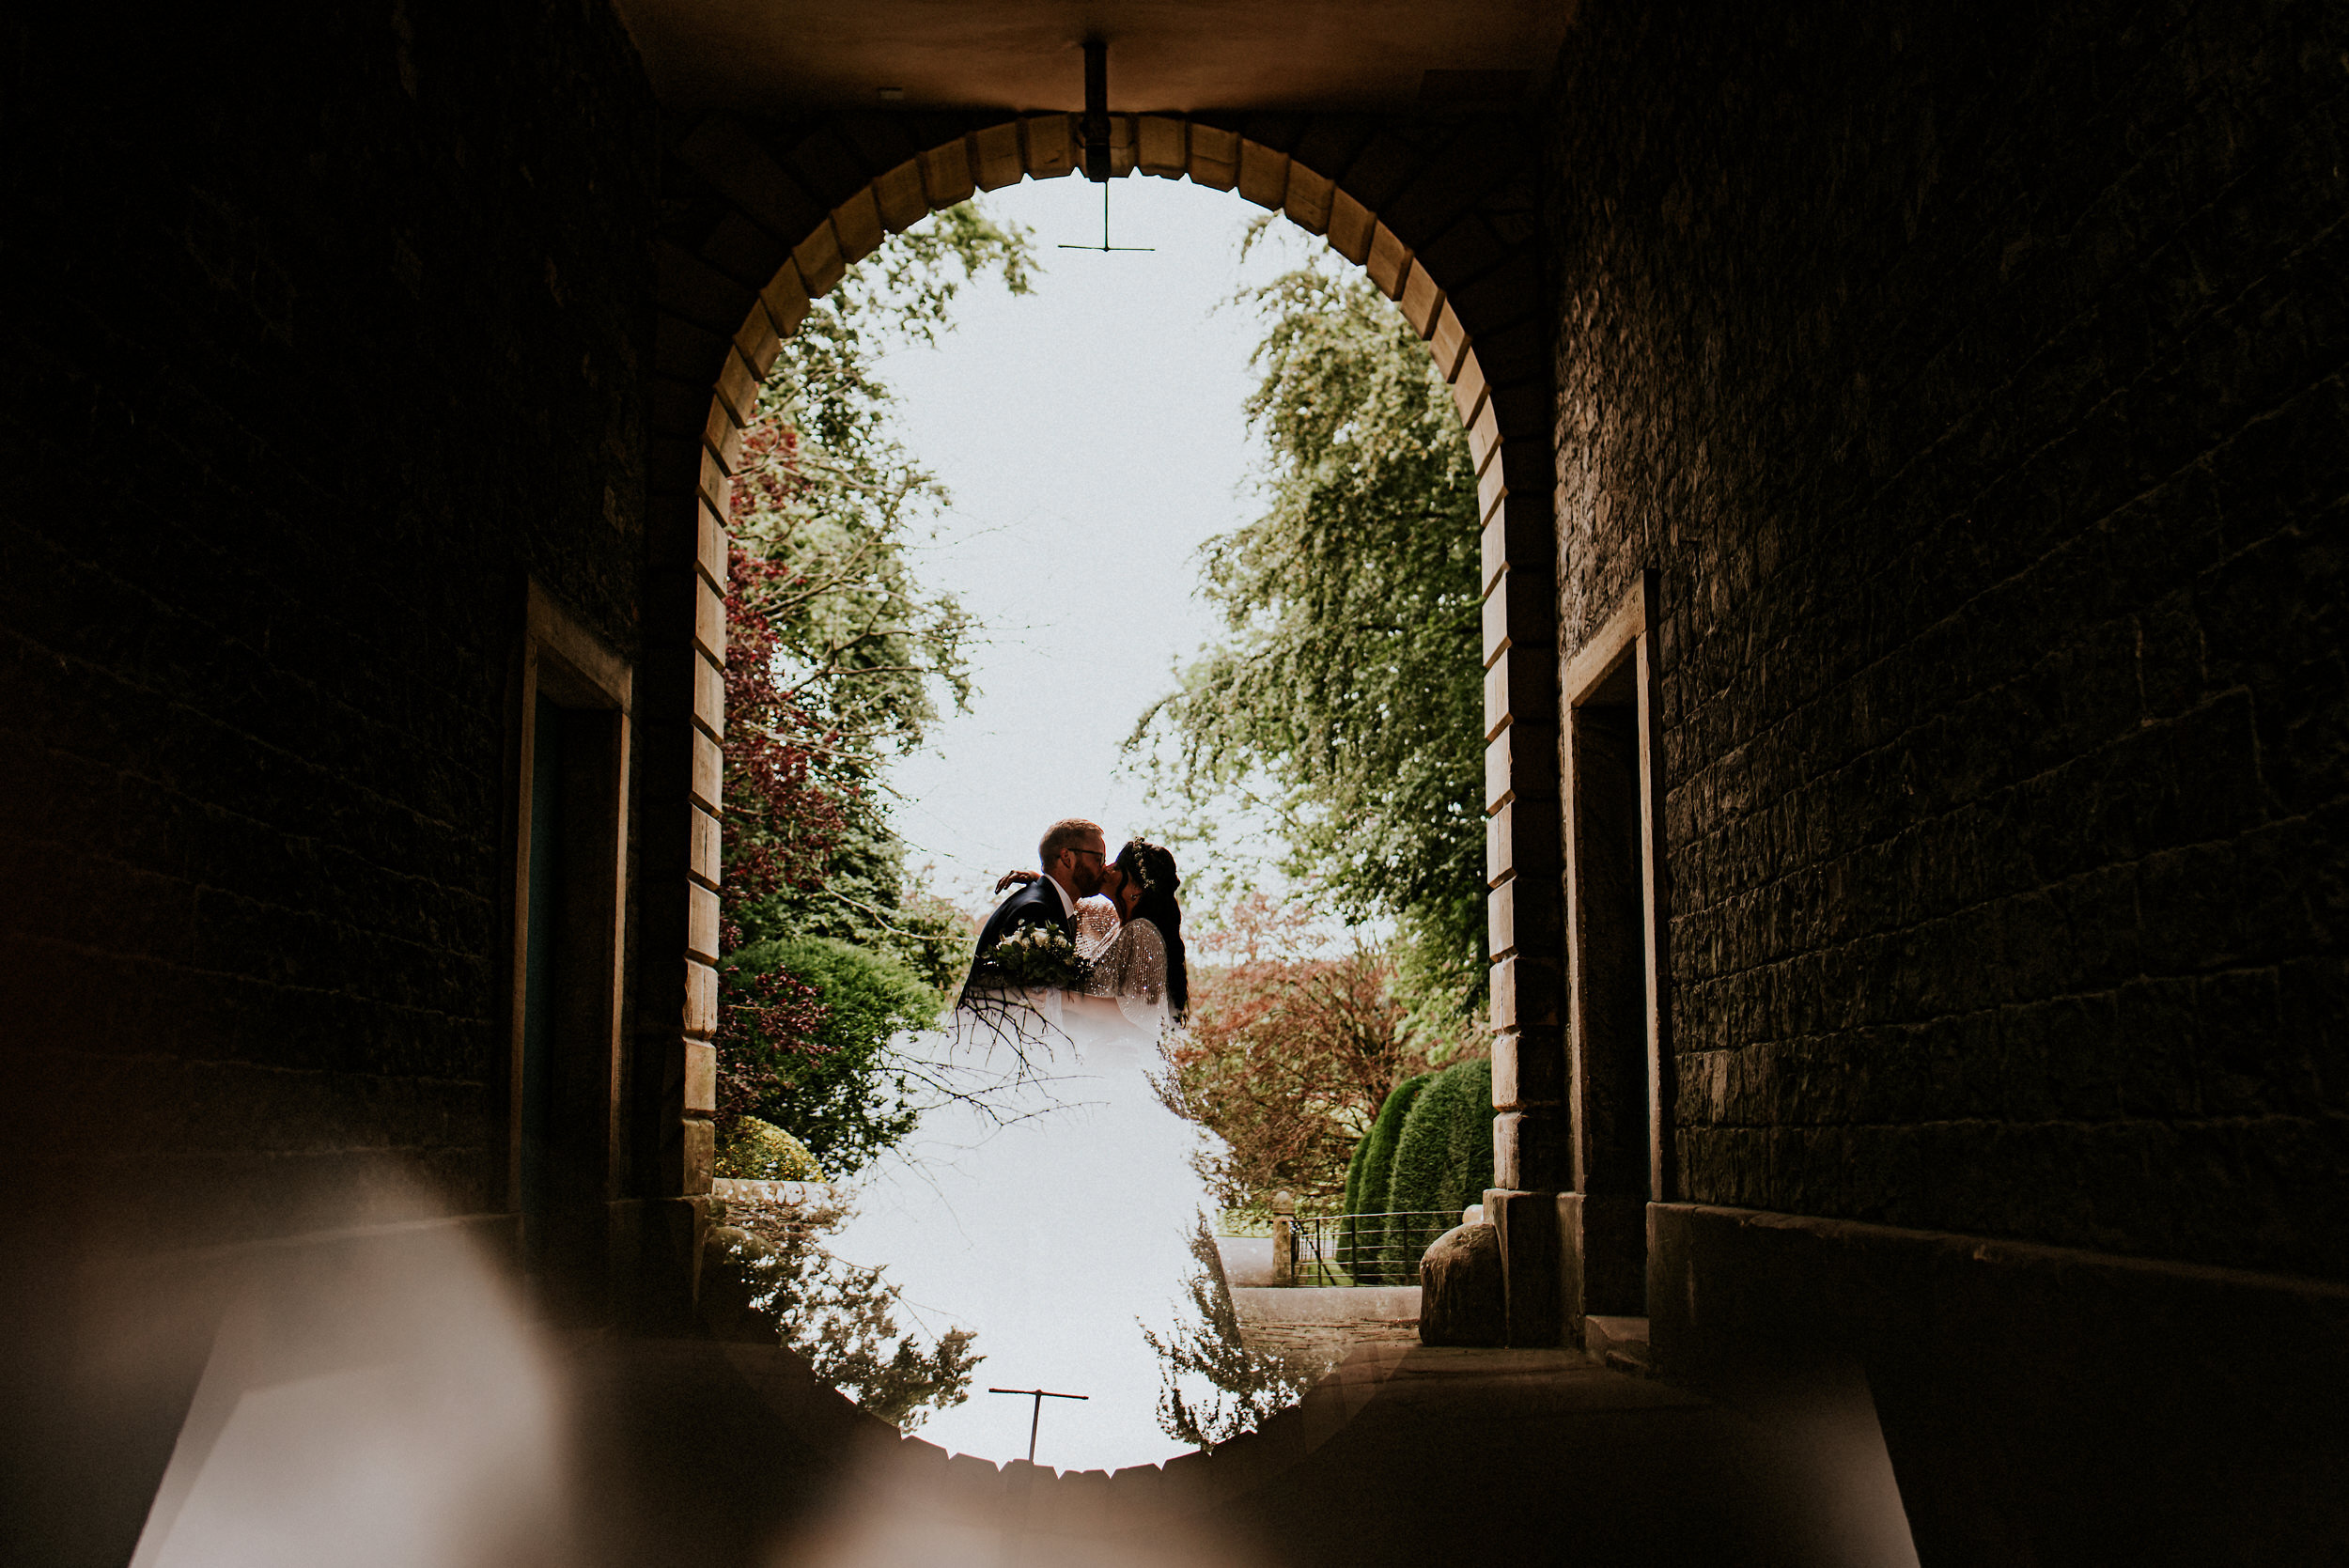 utopia-broughton-hall-skipton-wedding-photography-shutter-go-click-50.jpg